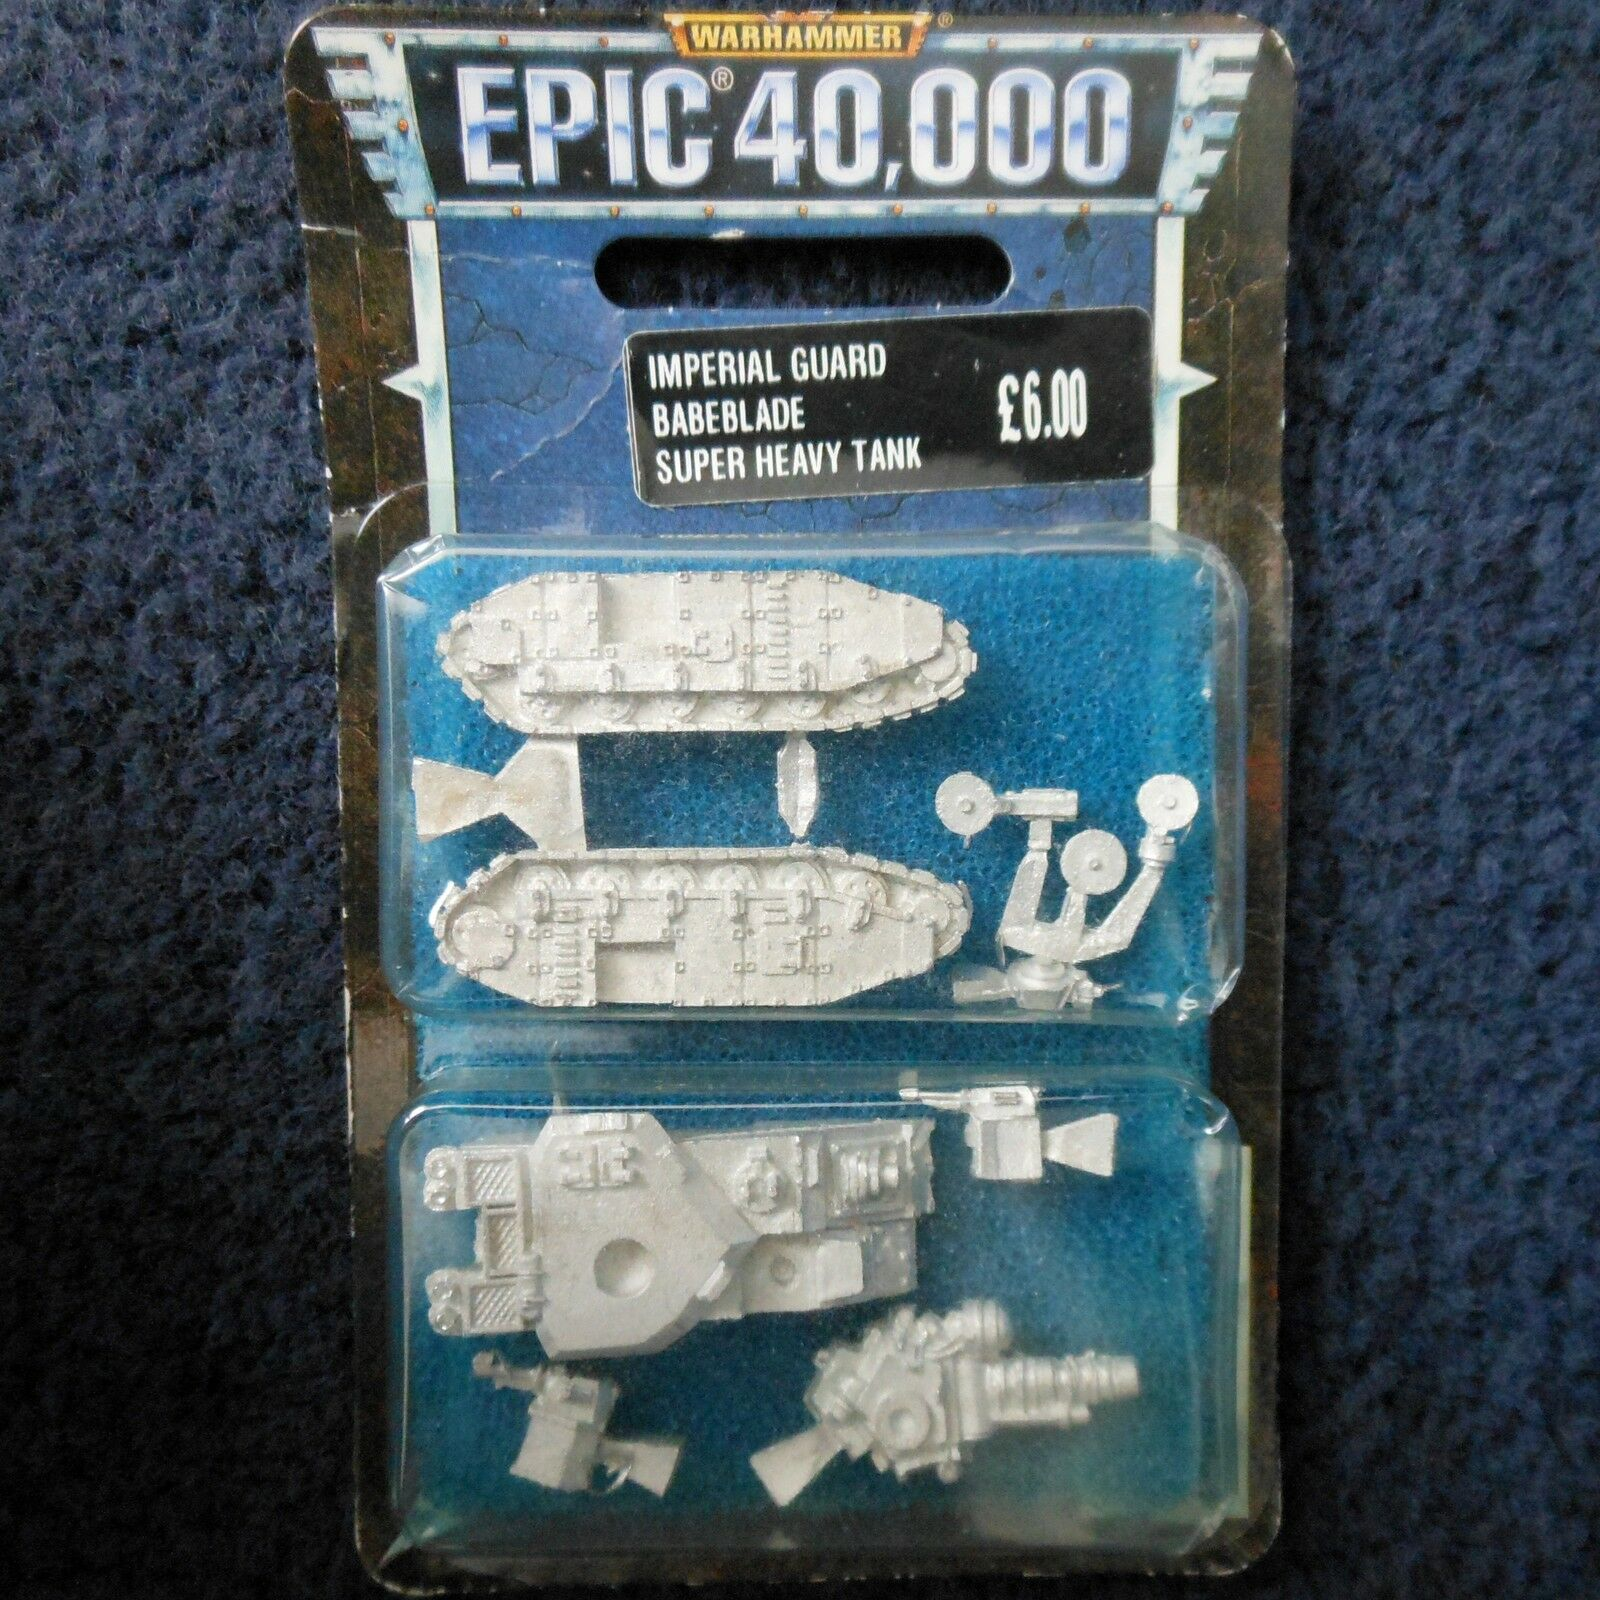 1998 Epic Imperial Guard Baneblade Super Heavy Tank Citadel Warhammer 40K MIB GW